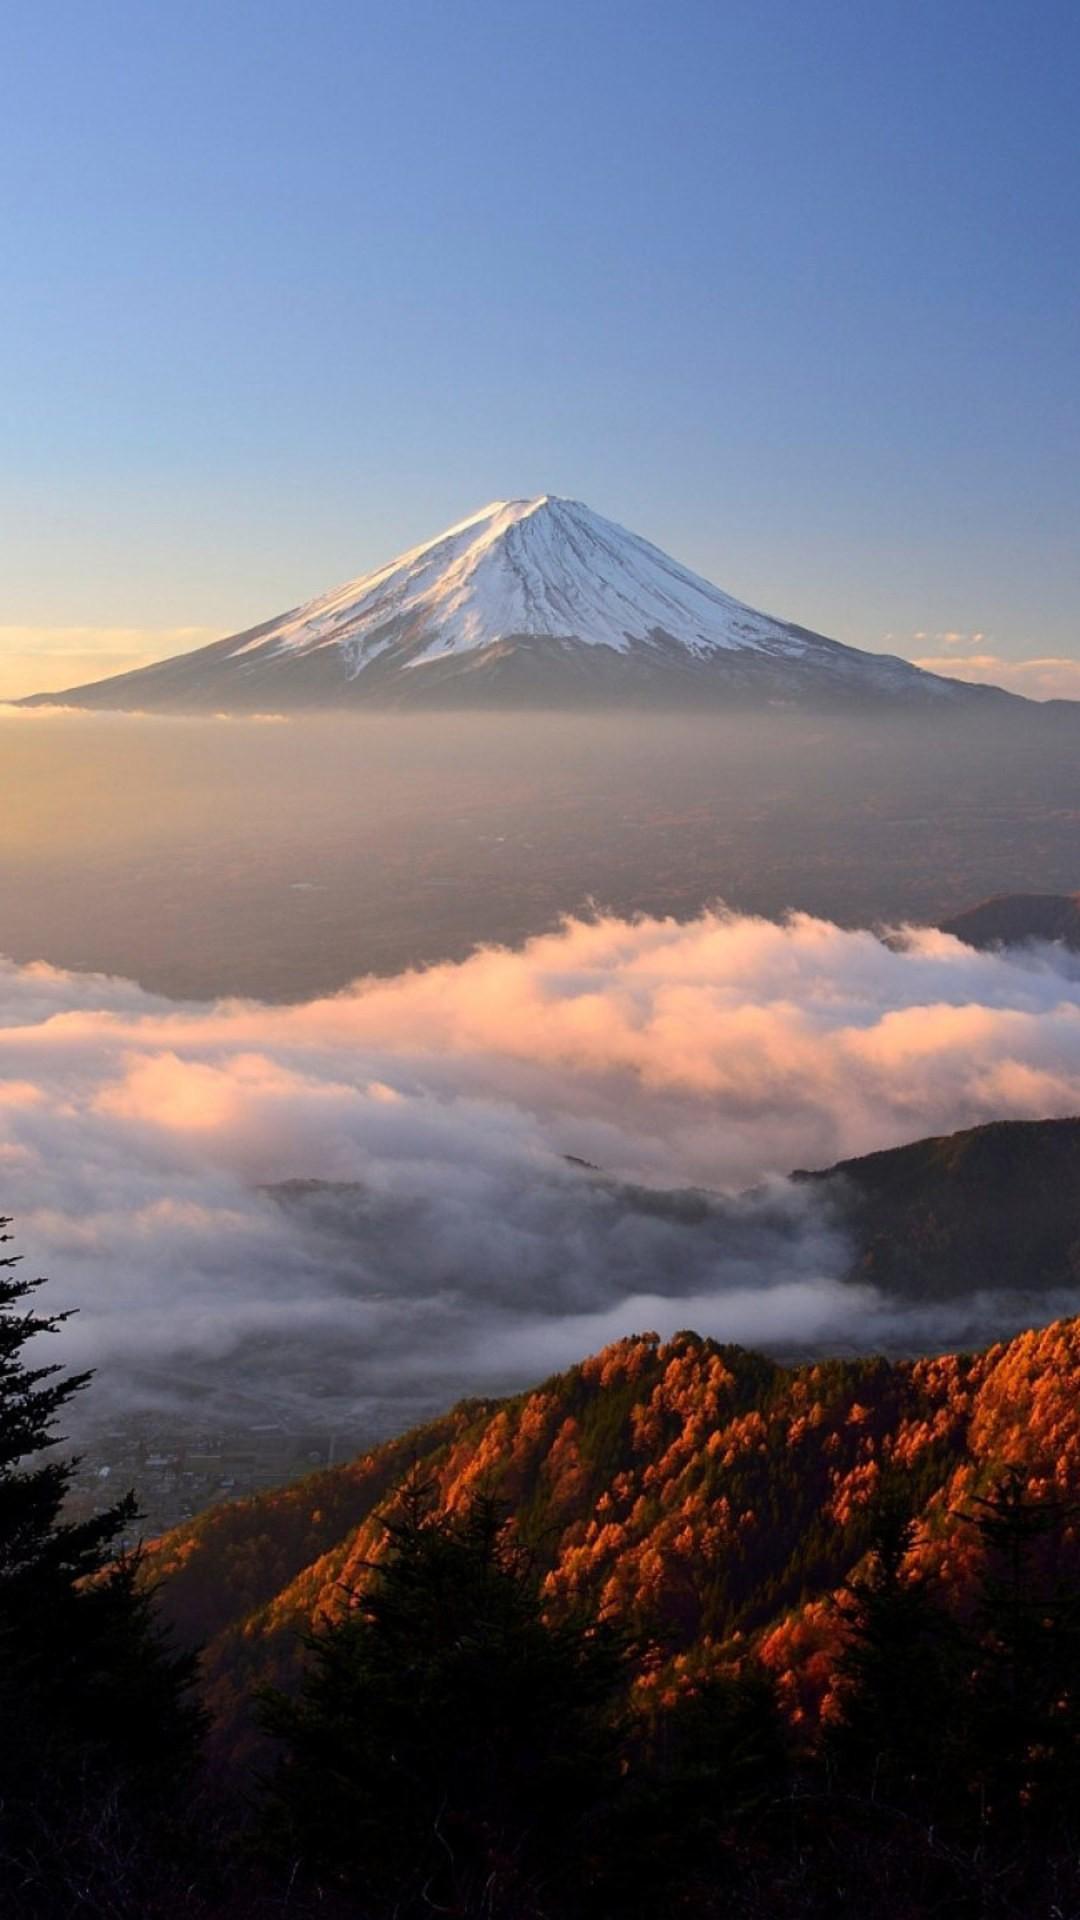 Mount Fuji QHD iPhone Wallpaper iphoneswallpapers com